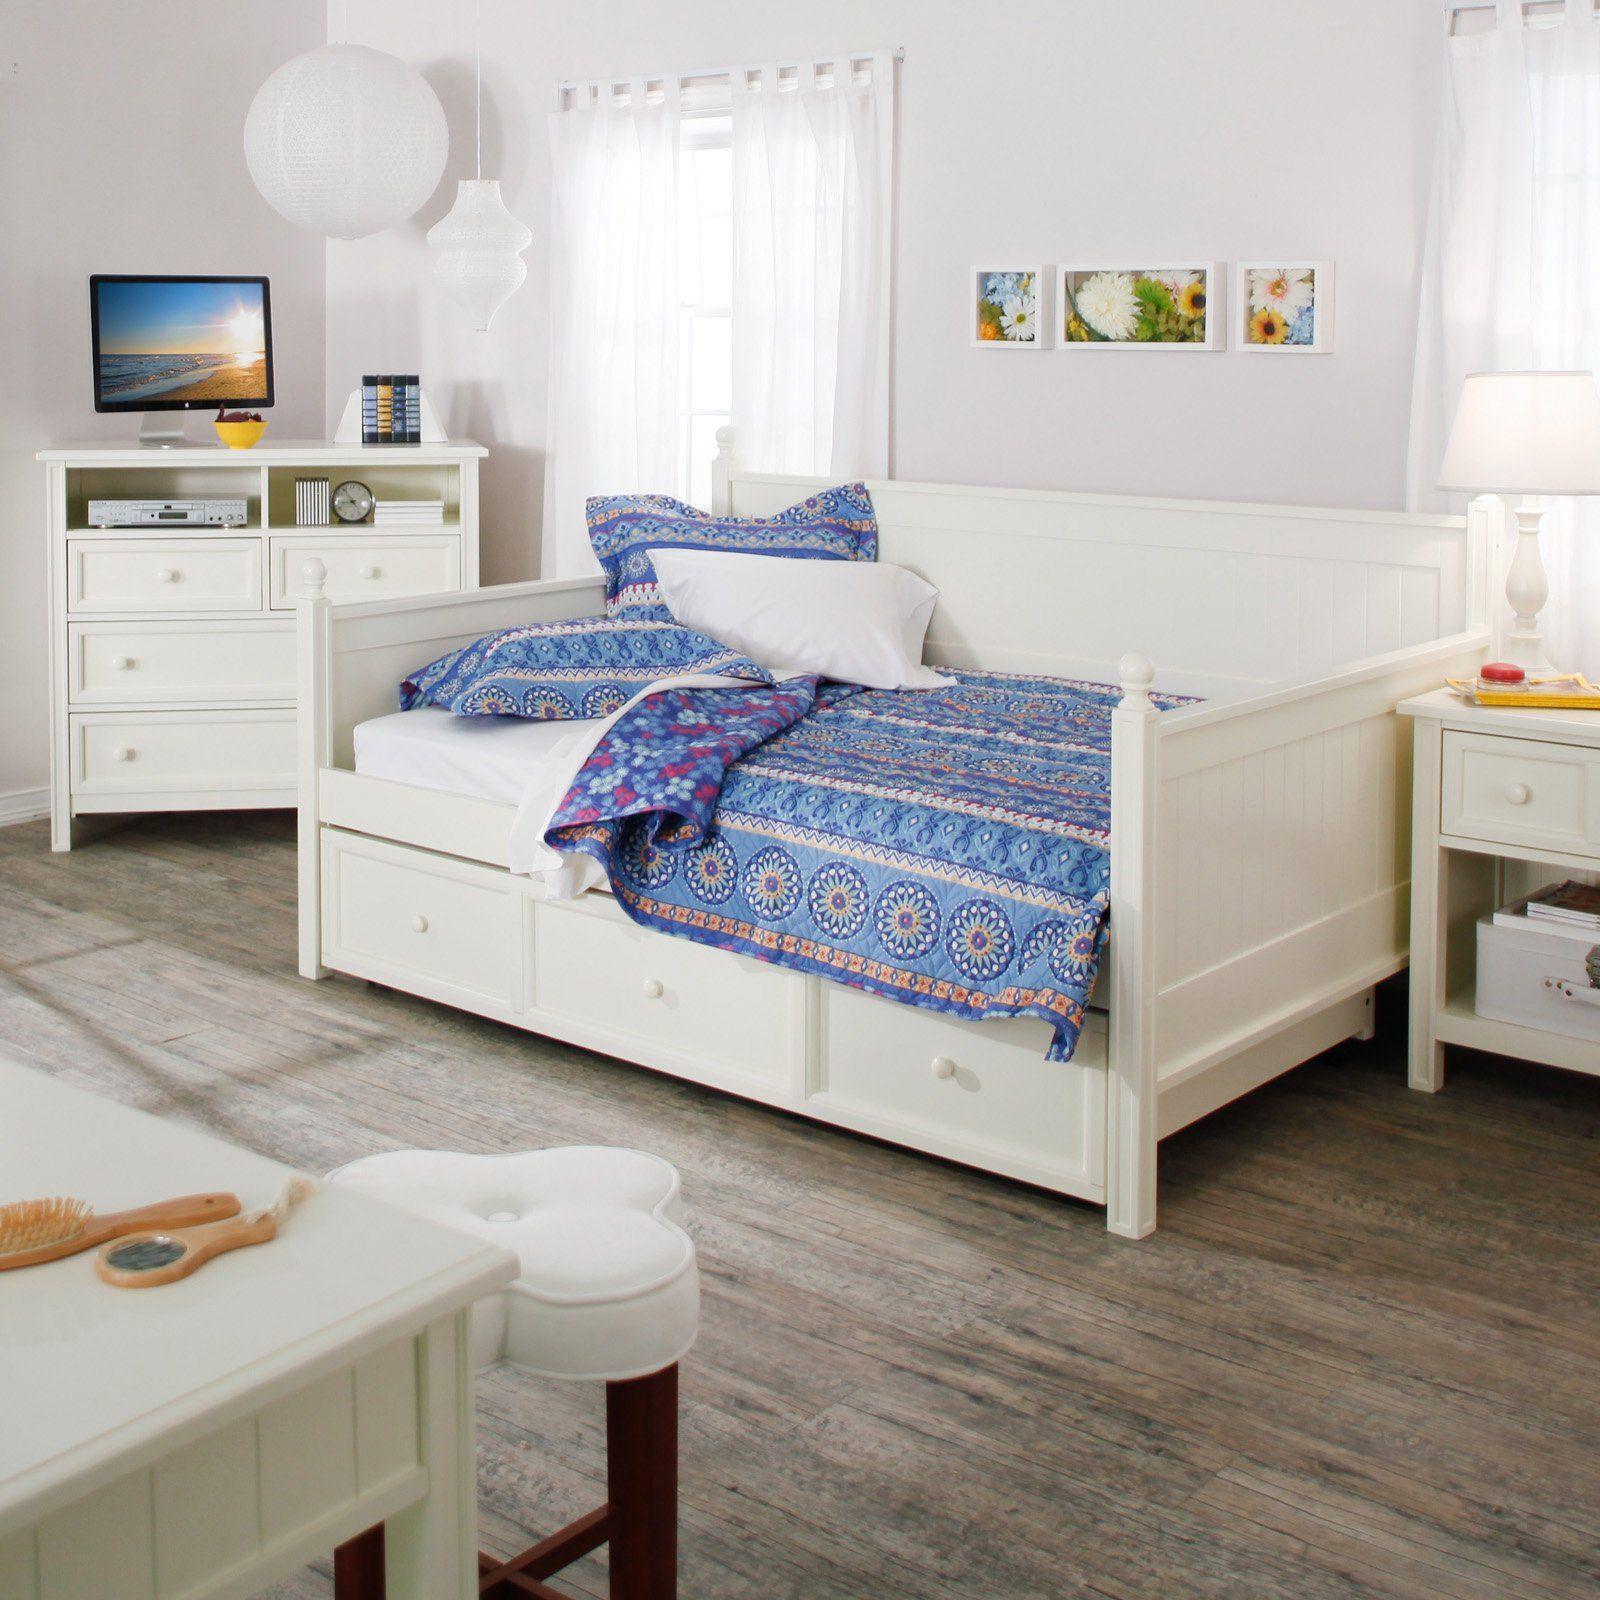 Plush Dreams Lt Pink Full/Queen Size Comforter Bed Set